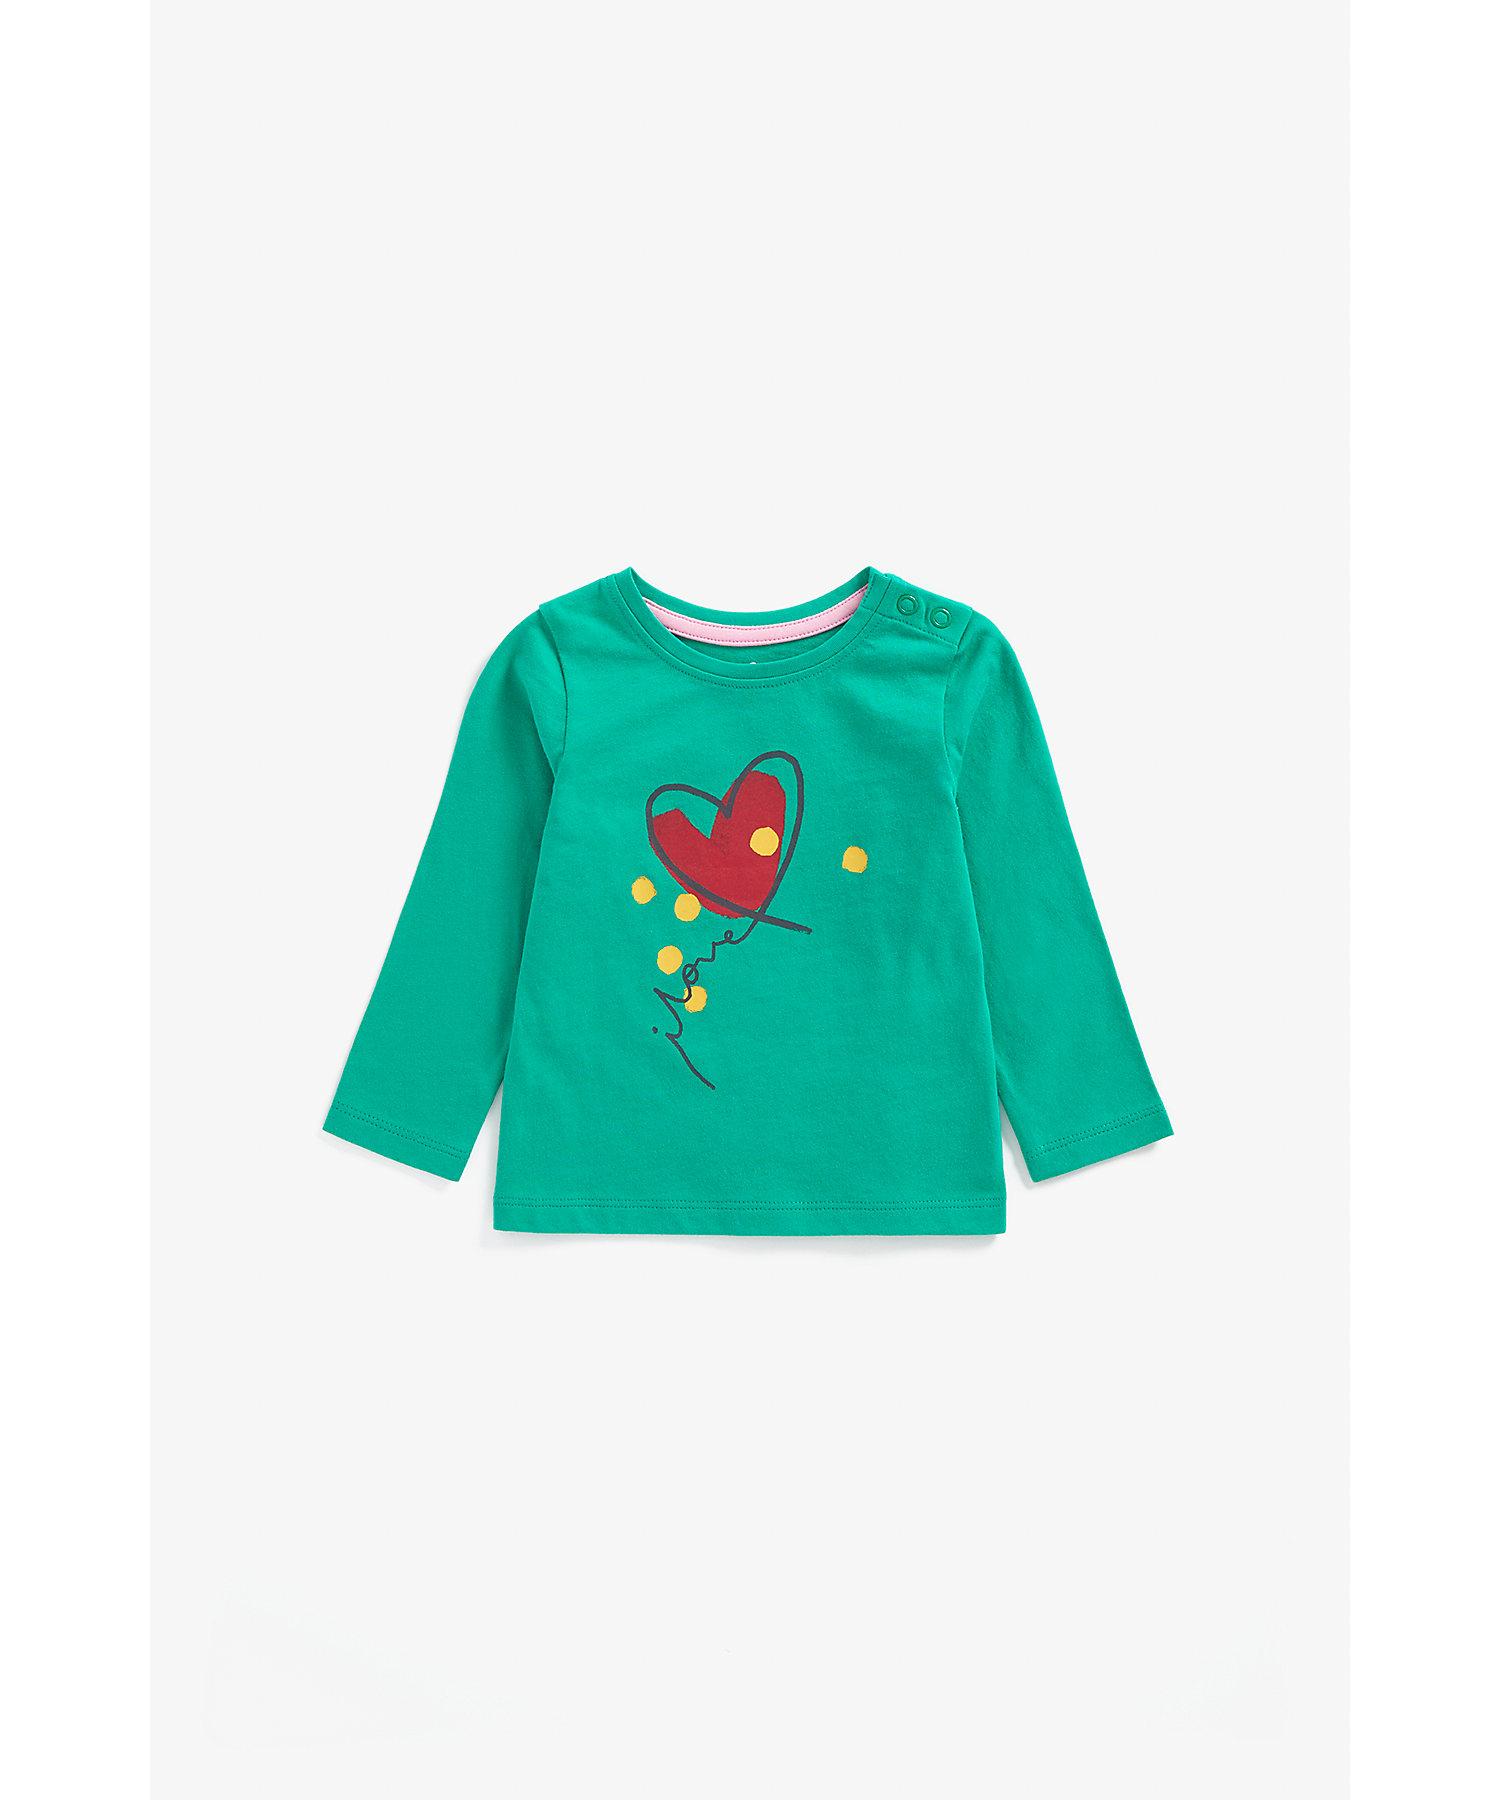 Mothercare | Girls Full Sleeves T-Shirt Heart Print - Green